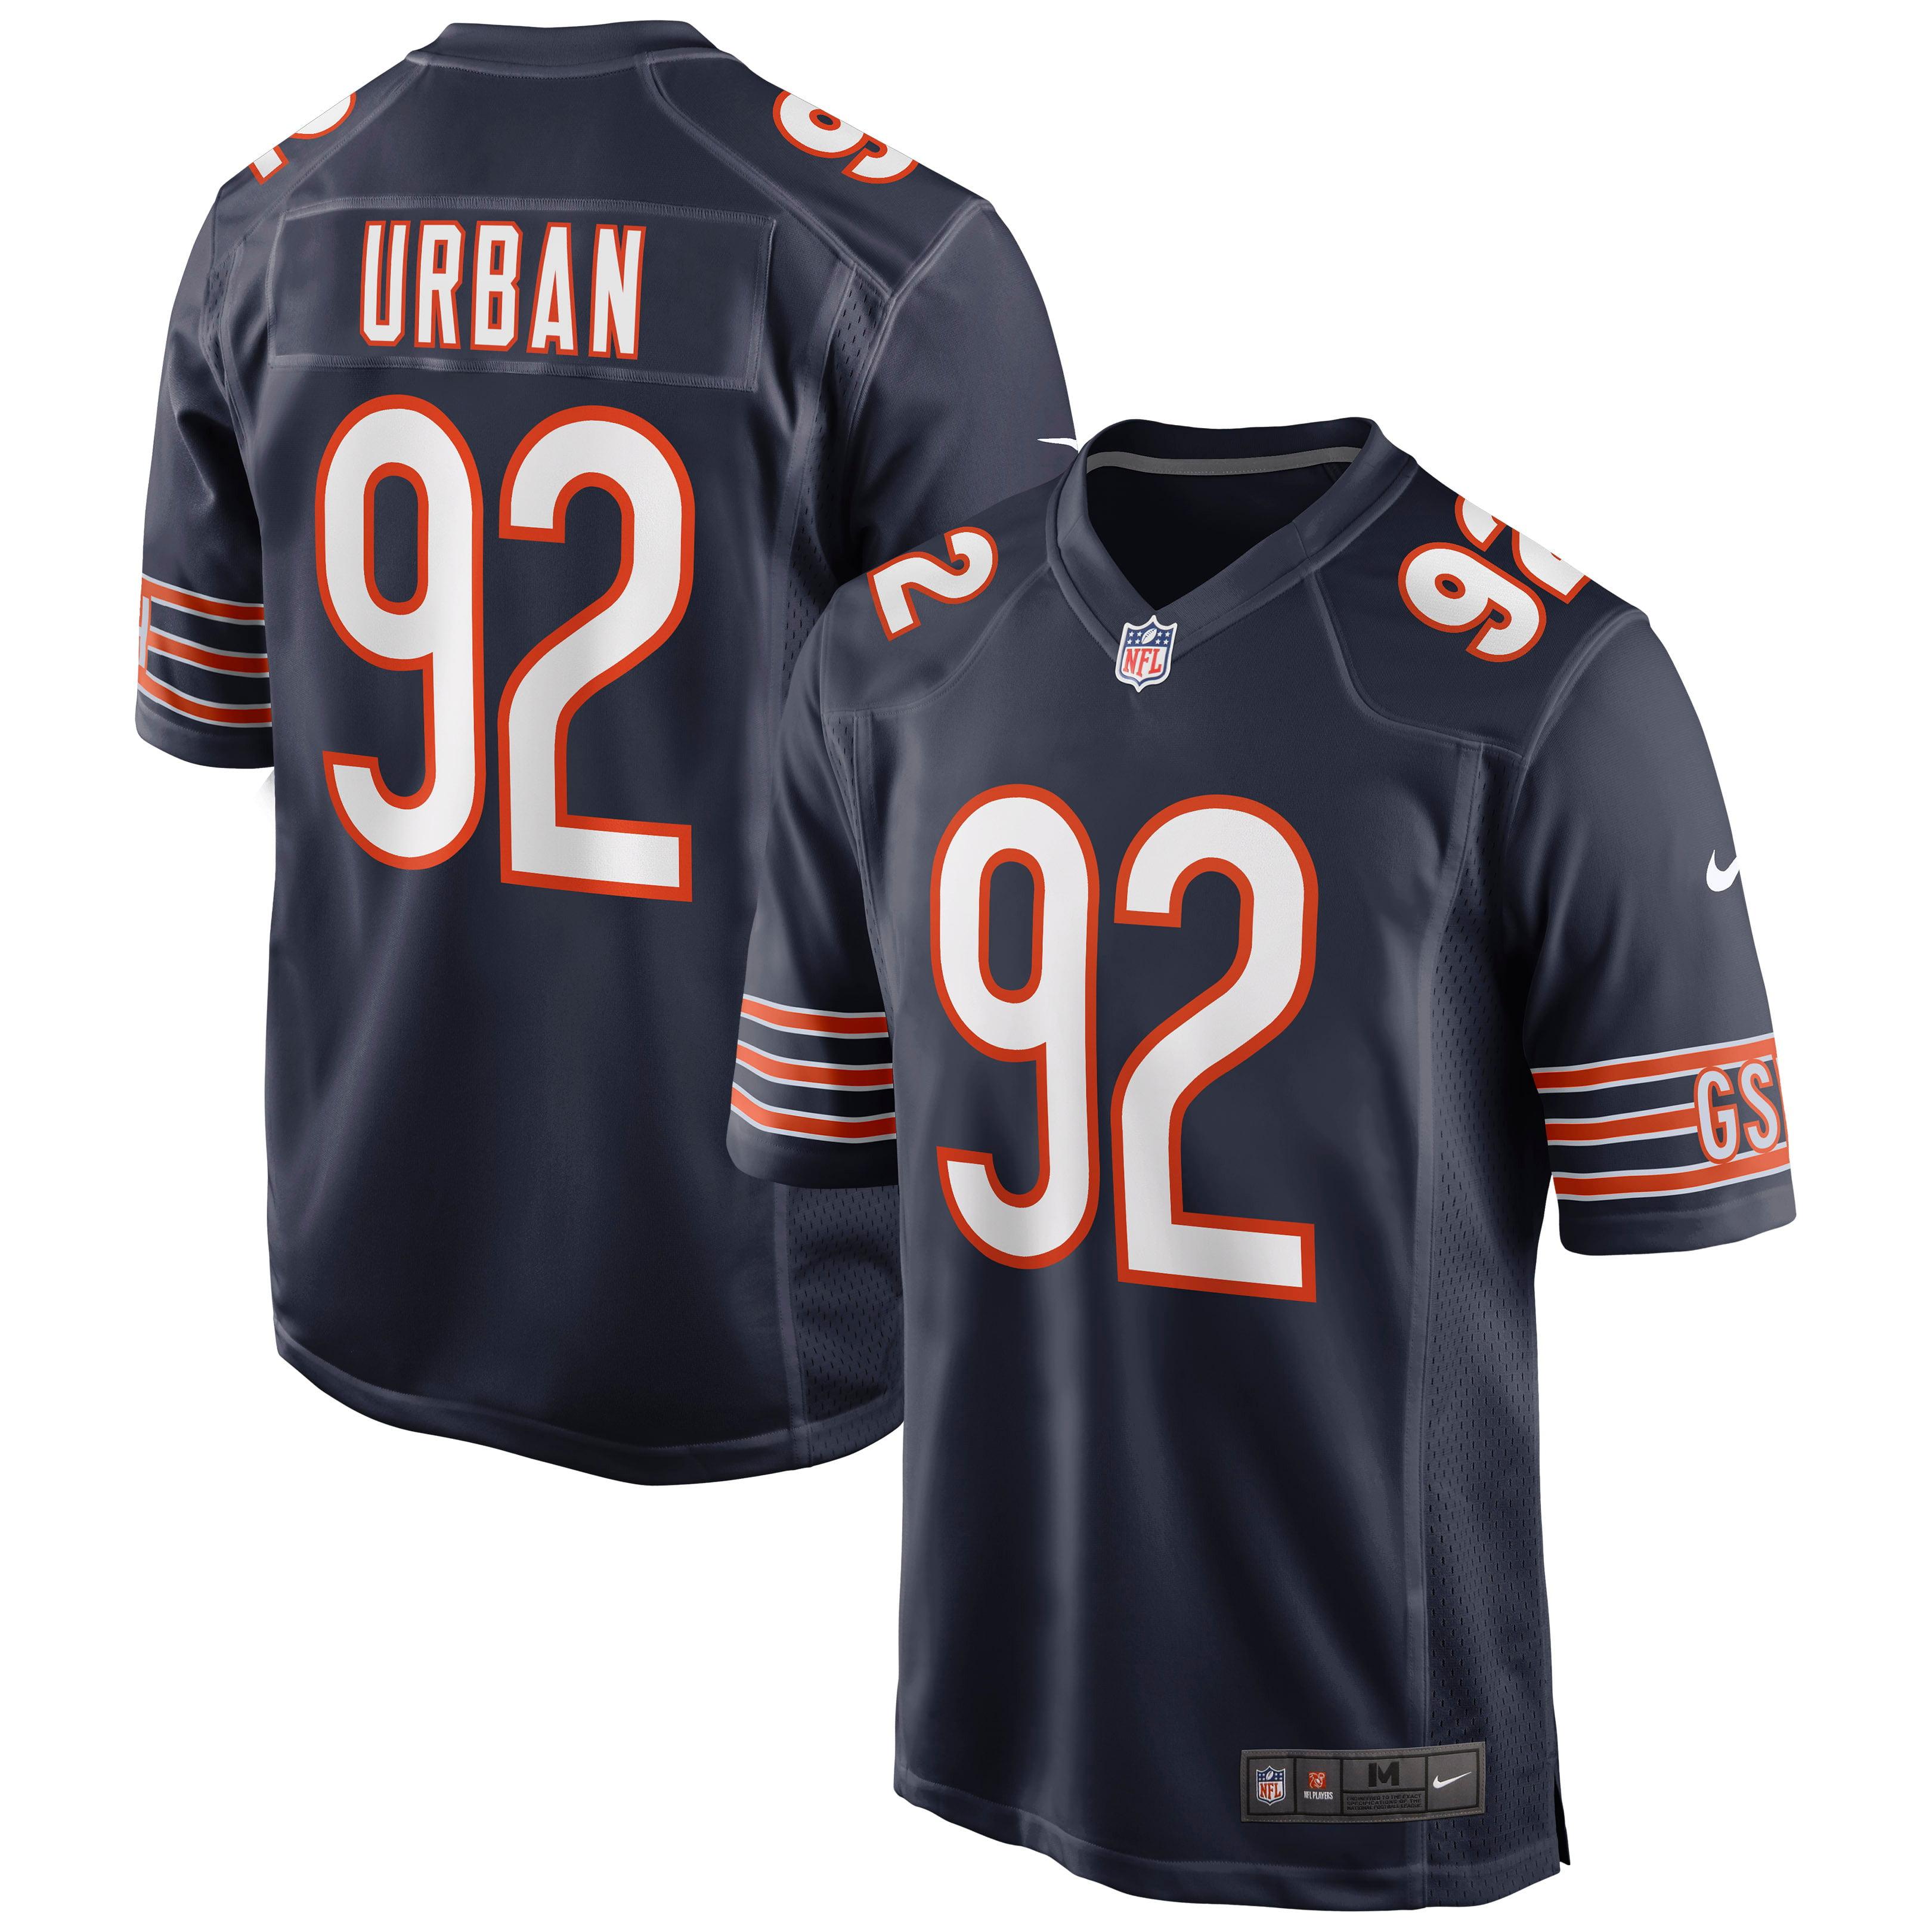 Brent Urban Chicago Bears Nike Game Jersey - Navy - Walmart.com